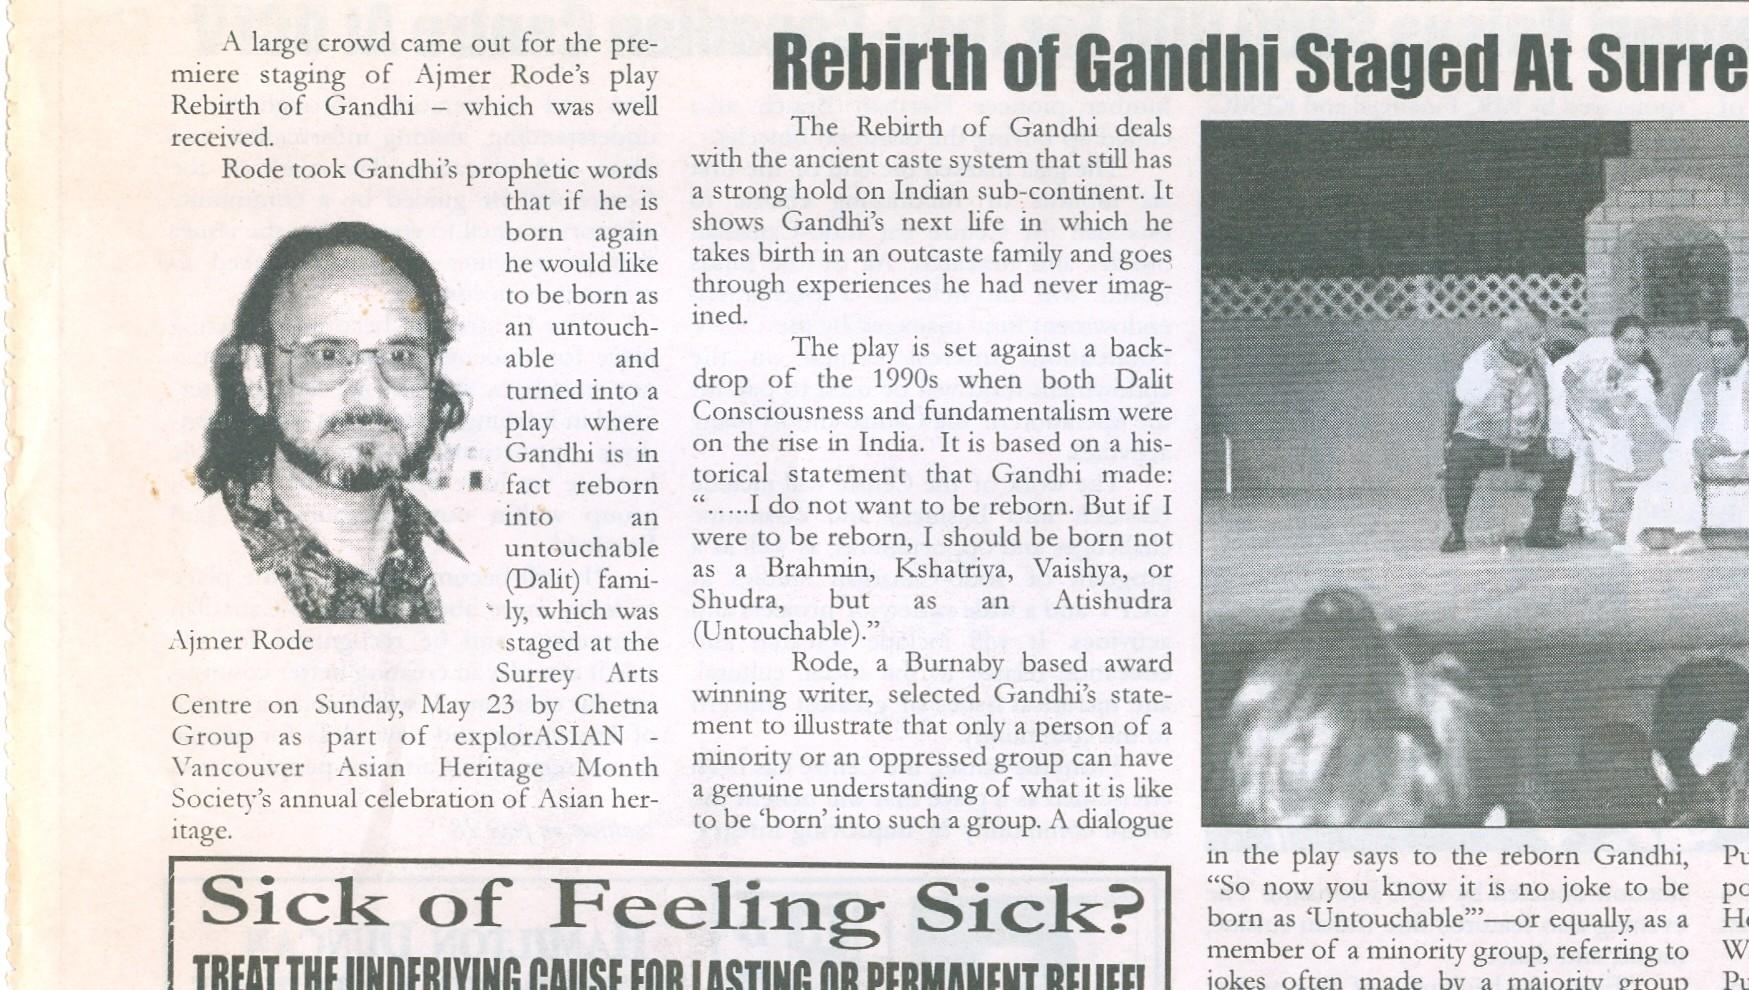 Rebirth of Gandhi -The Link